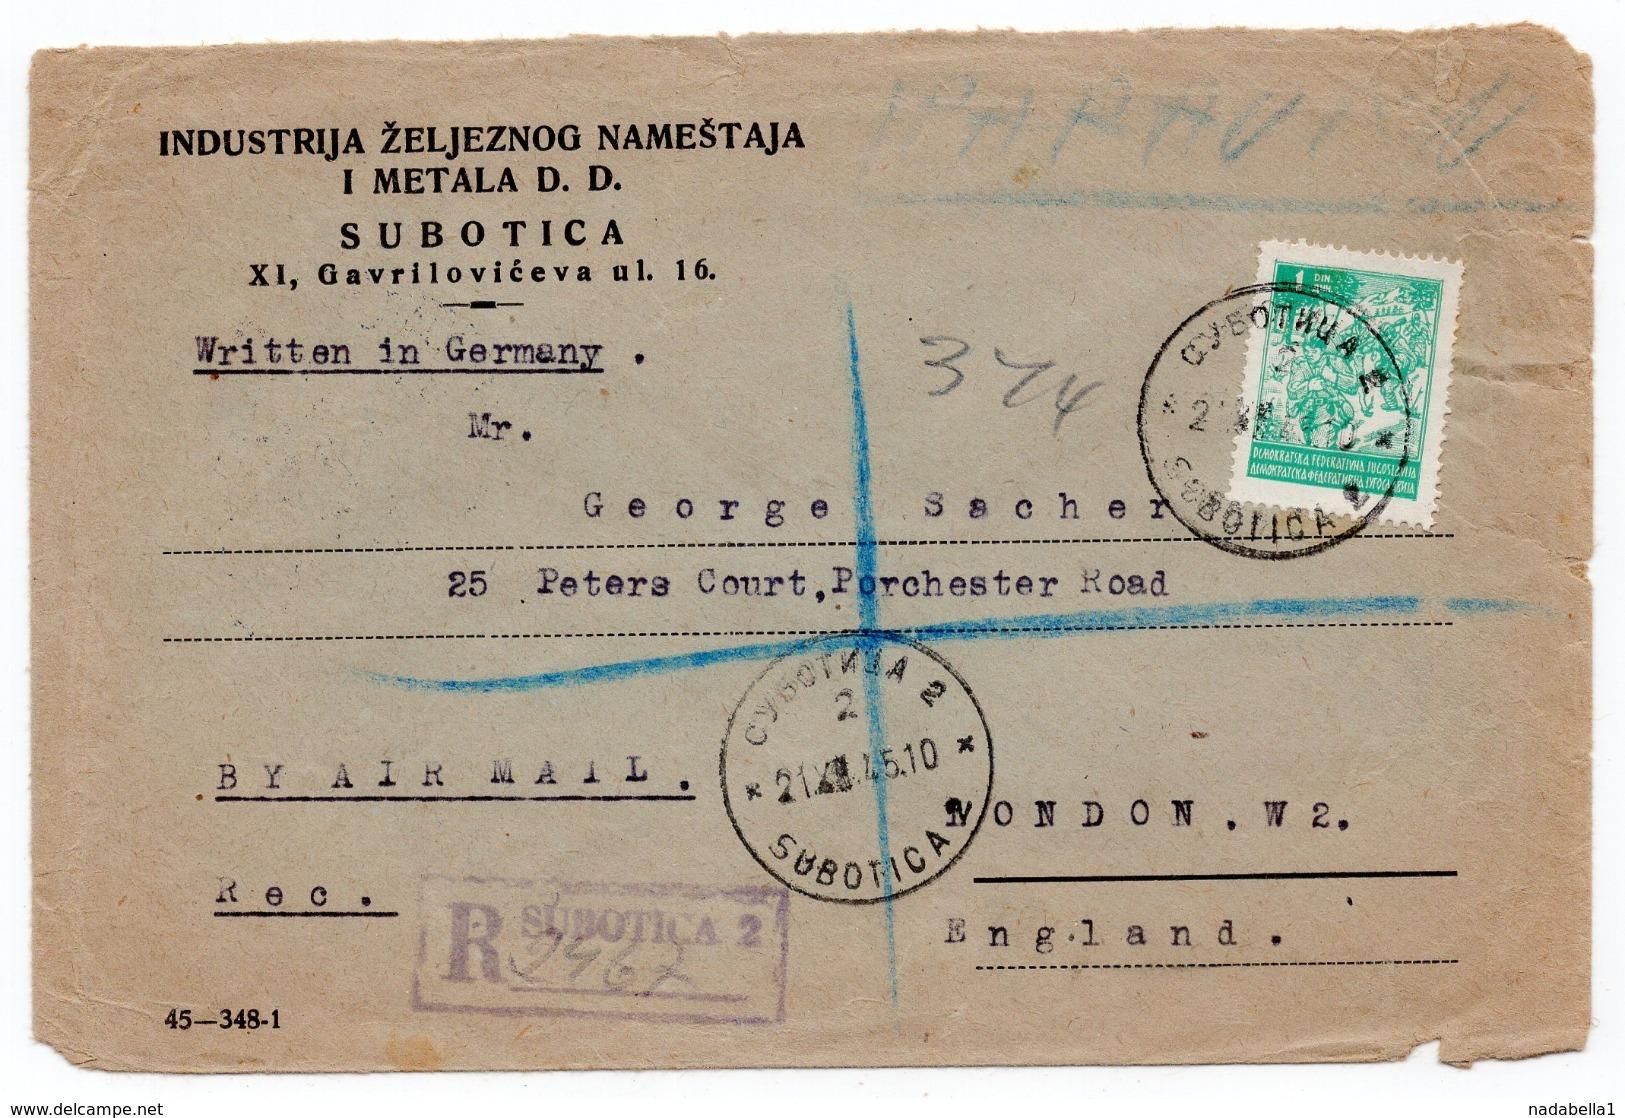 21.12.1945. YUGOSLAVIA, SERBIA, REGISTERED LETTER, SUBOTICA TO LONDON, UK, MILITARY COVER, CENSORED - 1945-1992 Socialistische Federale Republiek Joegoslavië